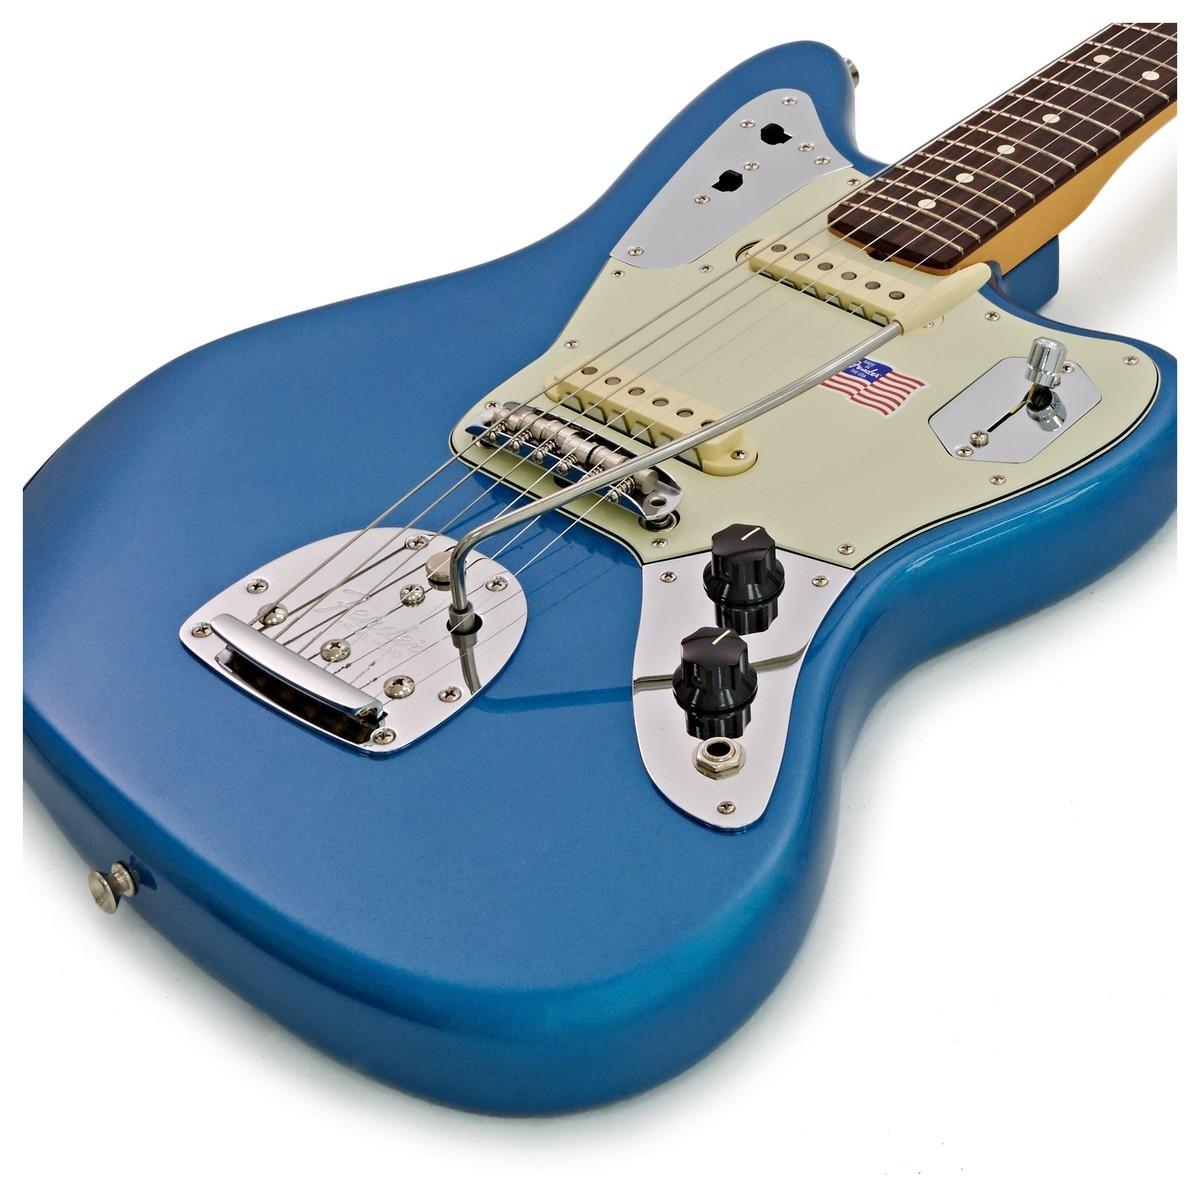 A118 Johnny Marr Fender Jaguar Wiring | Wiring ResourcesWiring Resources